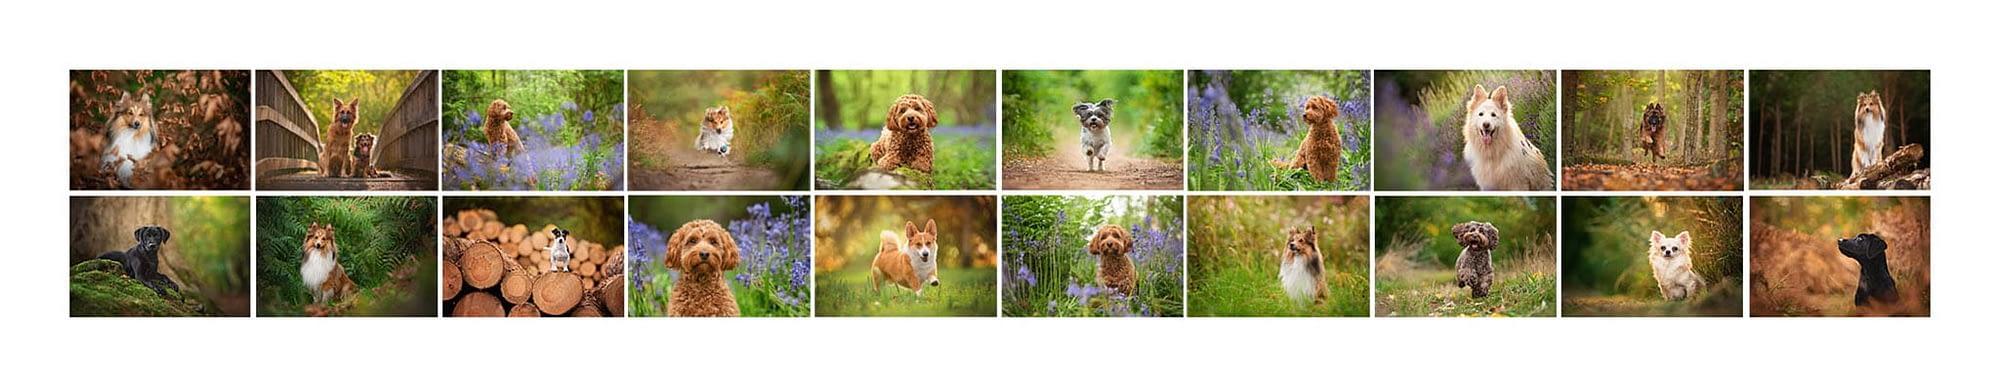 Josie Baughan Dog Photographer MPA Qualification Panel